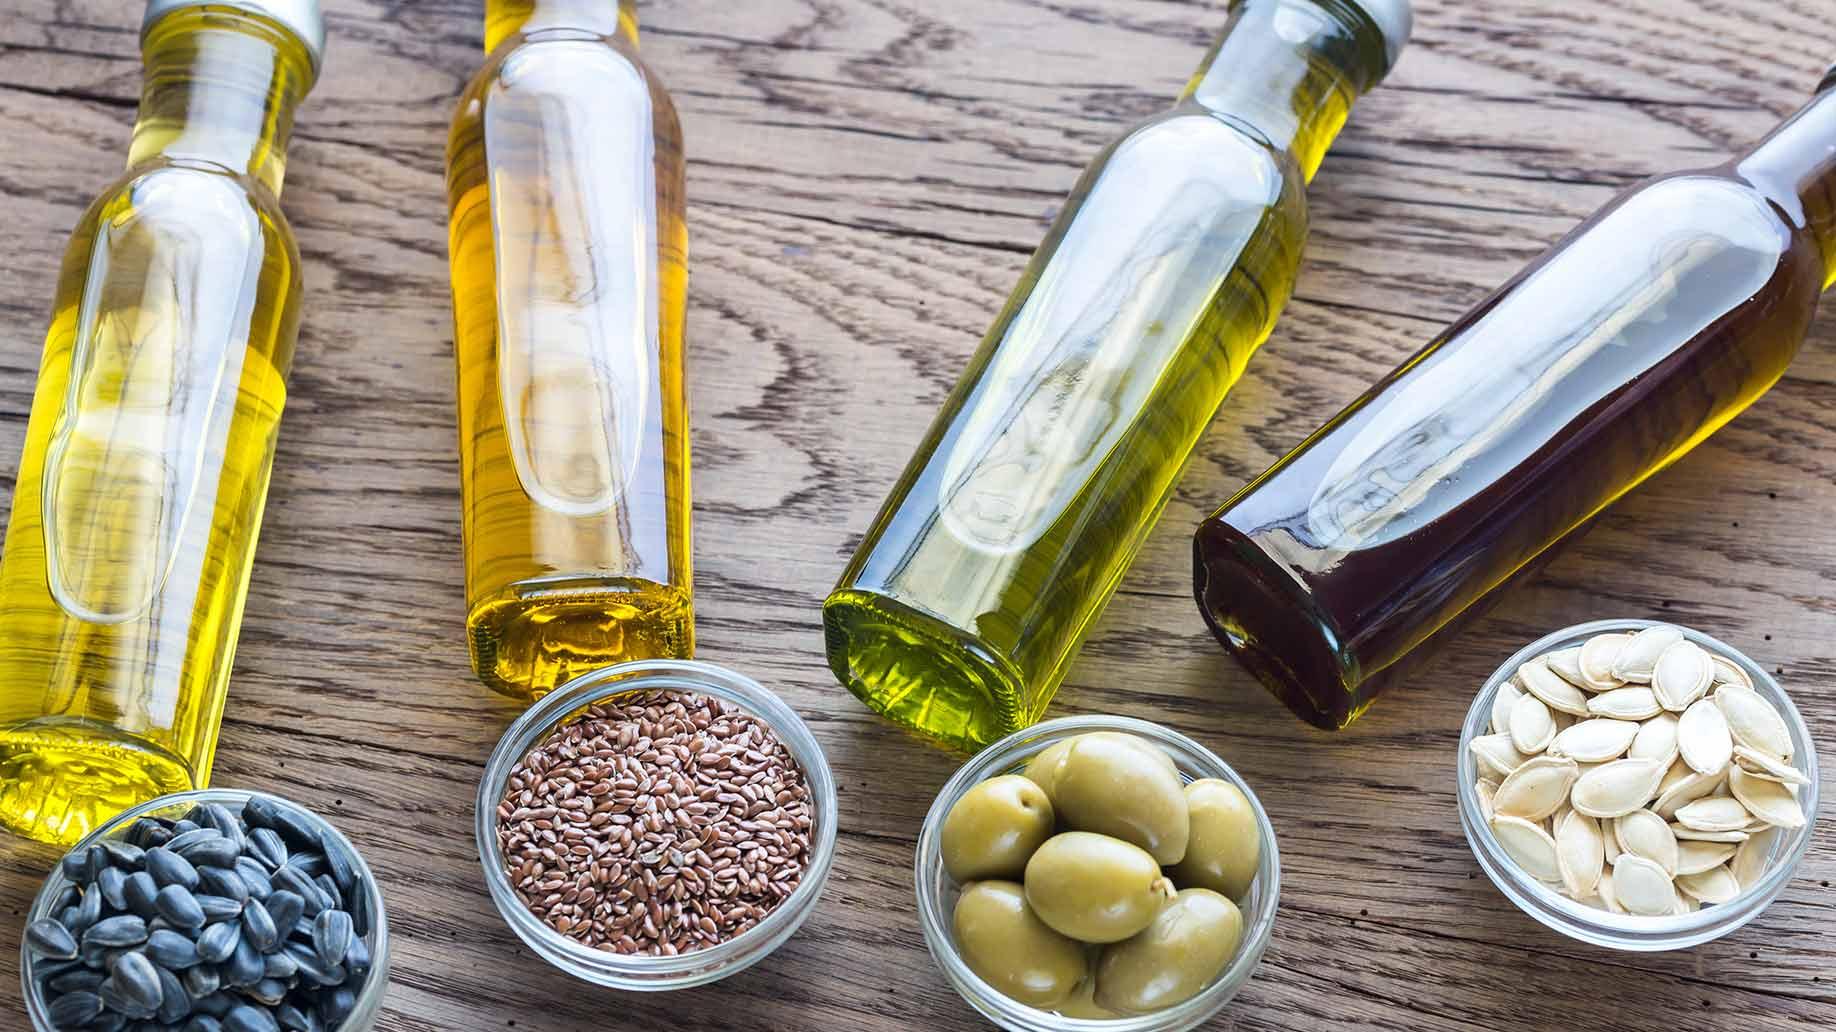 vegetable oils glossy shiny hair olive sunflower almond sesame natural diy homemade shampoo ingredients